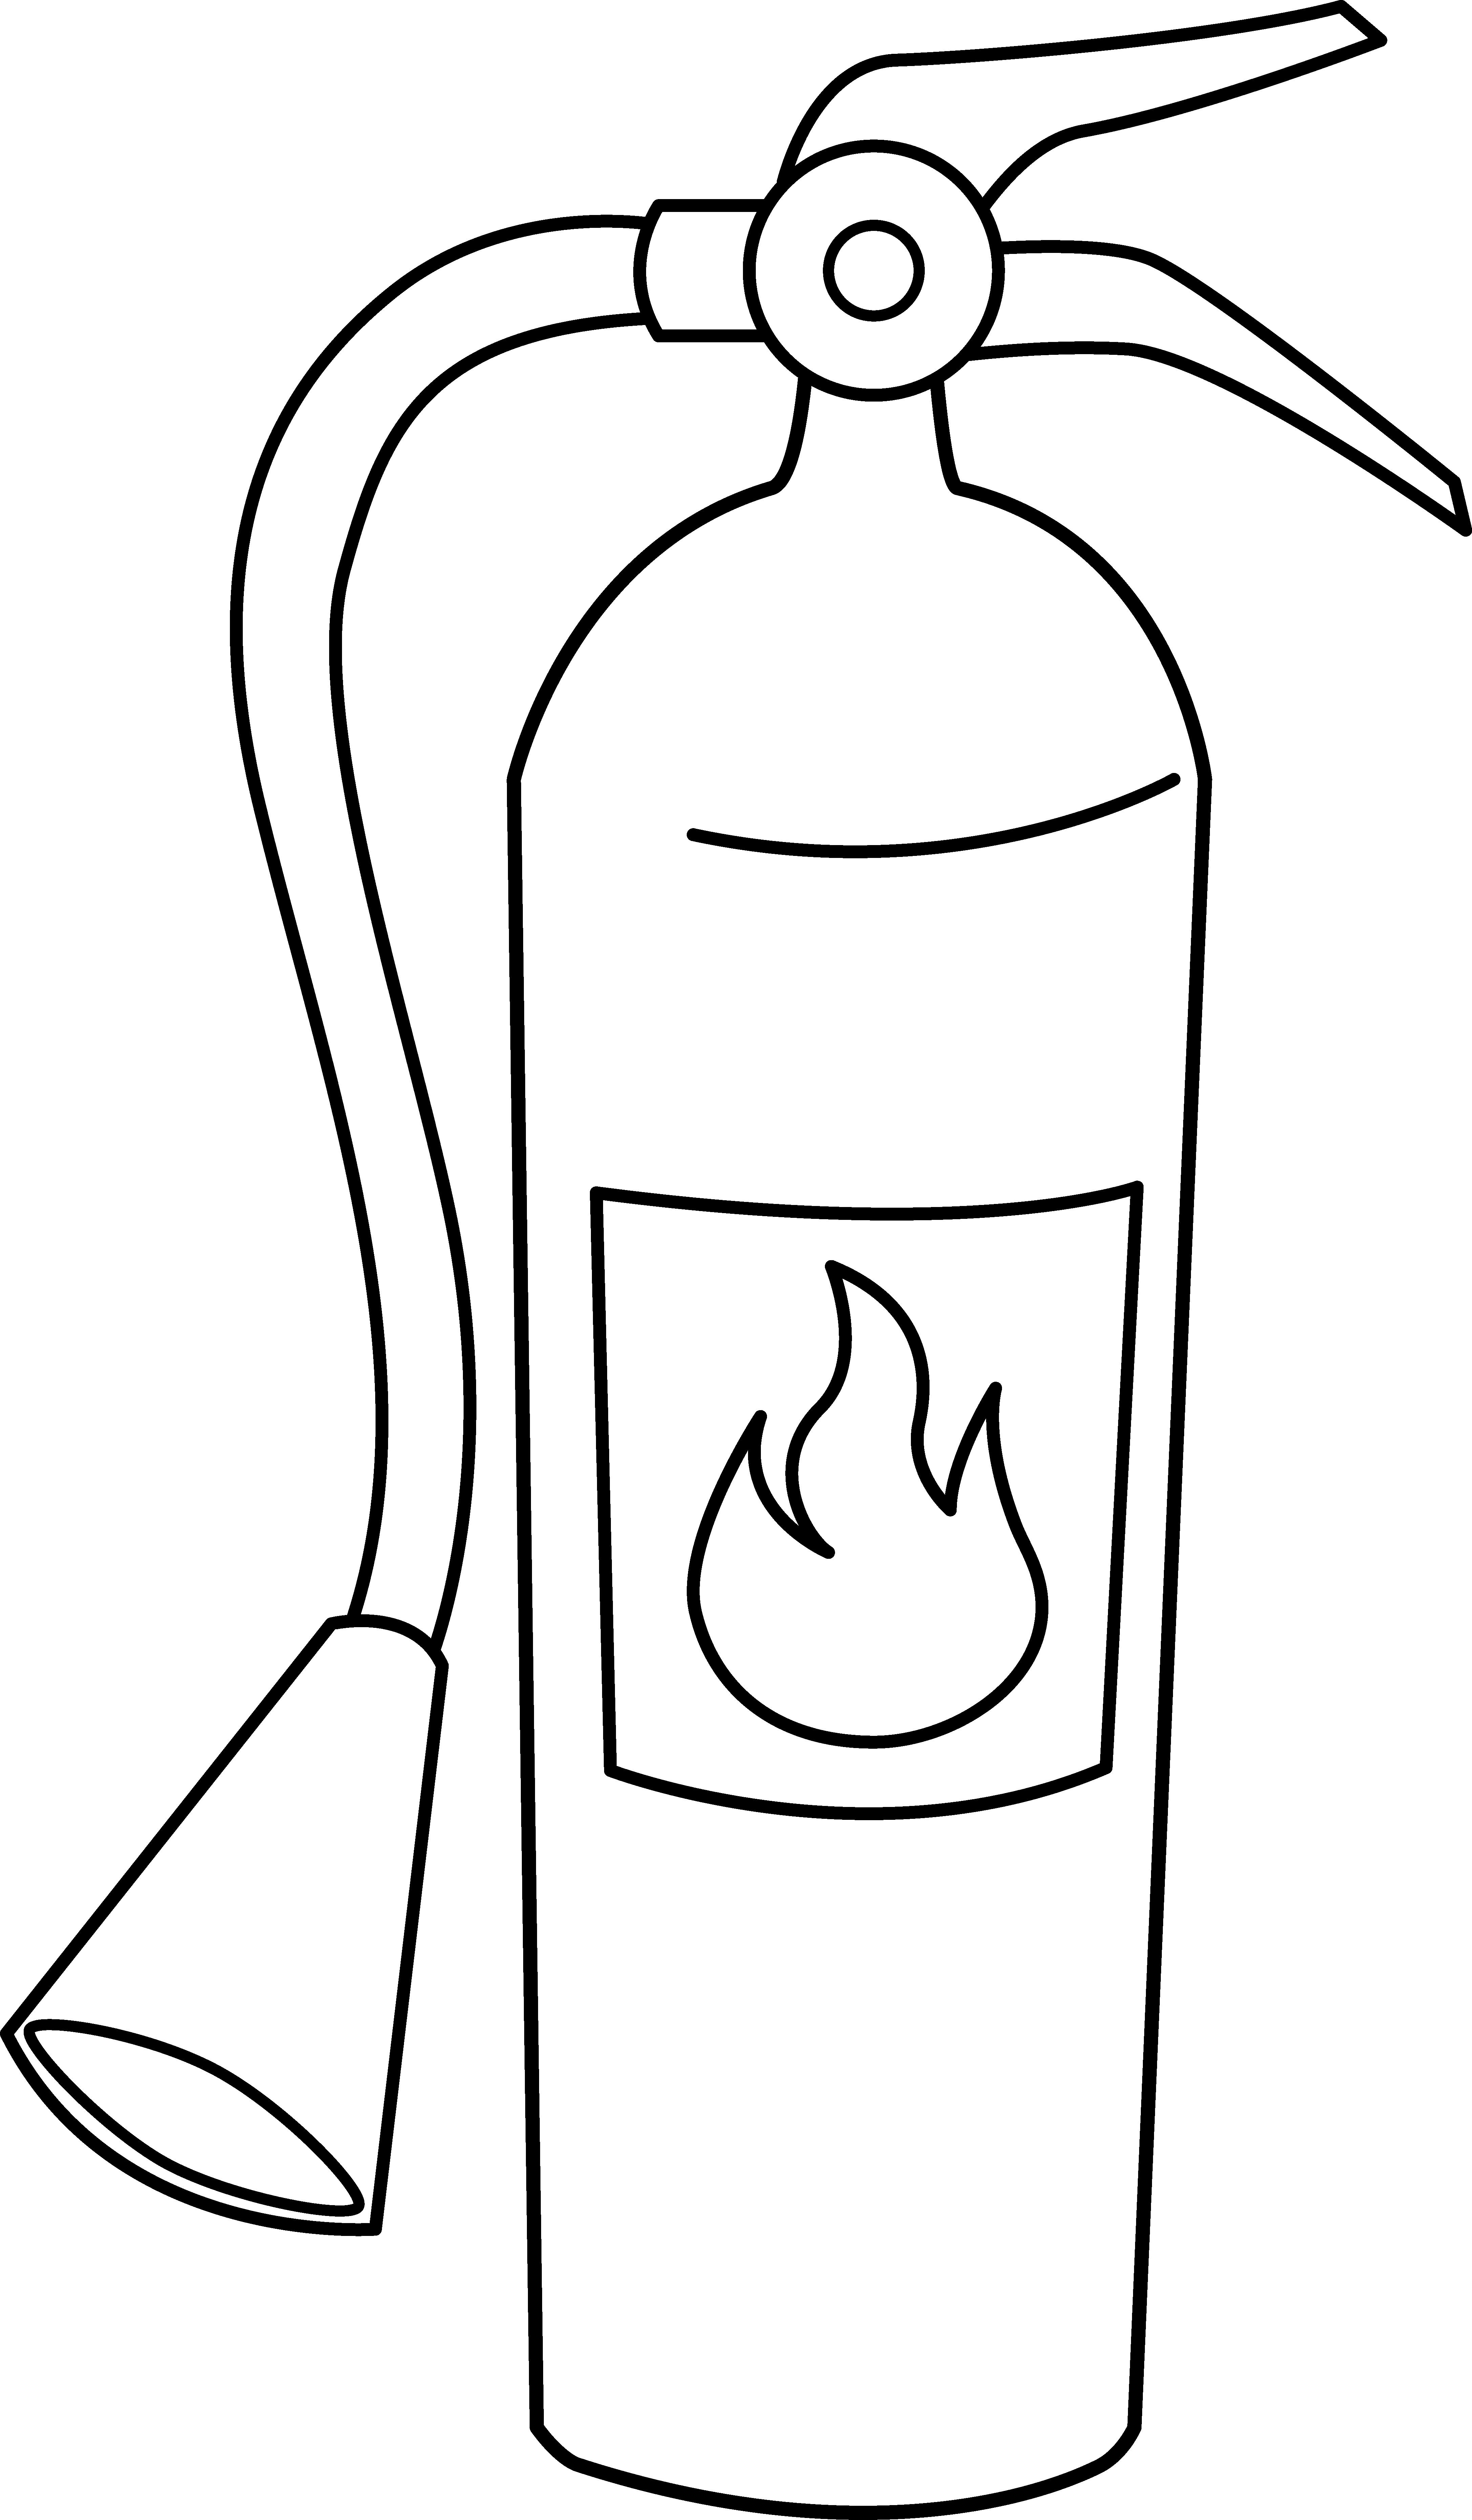 Fire Extinguisher Line Art Free Clip Art Fire Safety Preschool Crafts Fire Safety Week Crafts Fire Crafts